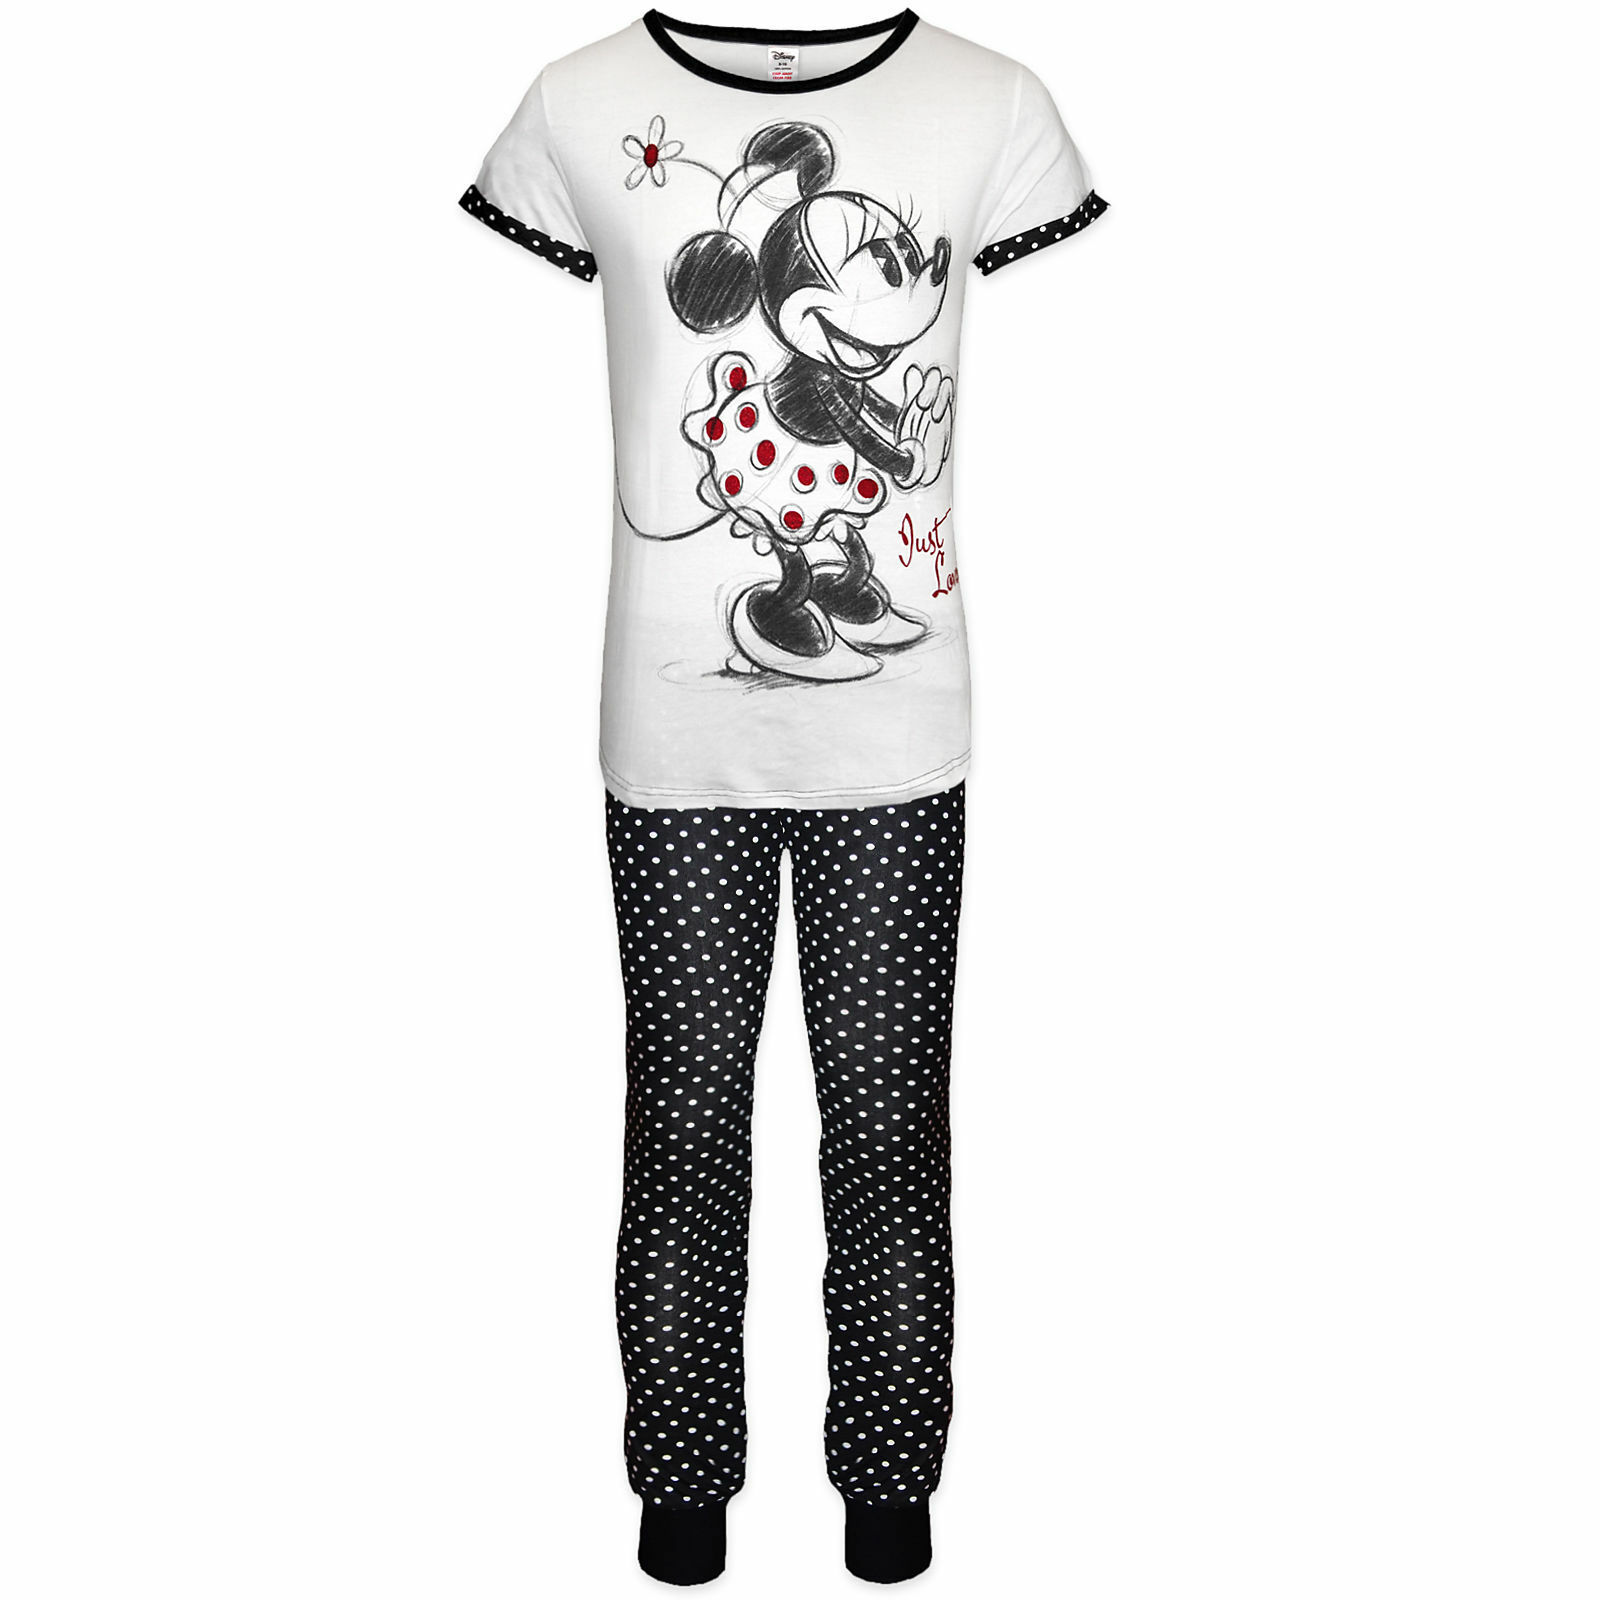 Ladies Disney Pyjamas Set Womens George Pjs Gift Cuff Leg Trousers T-Shirt Girls